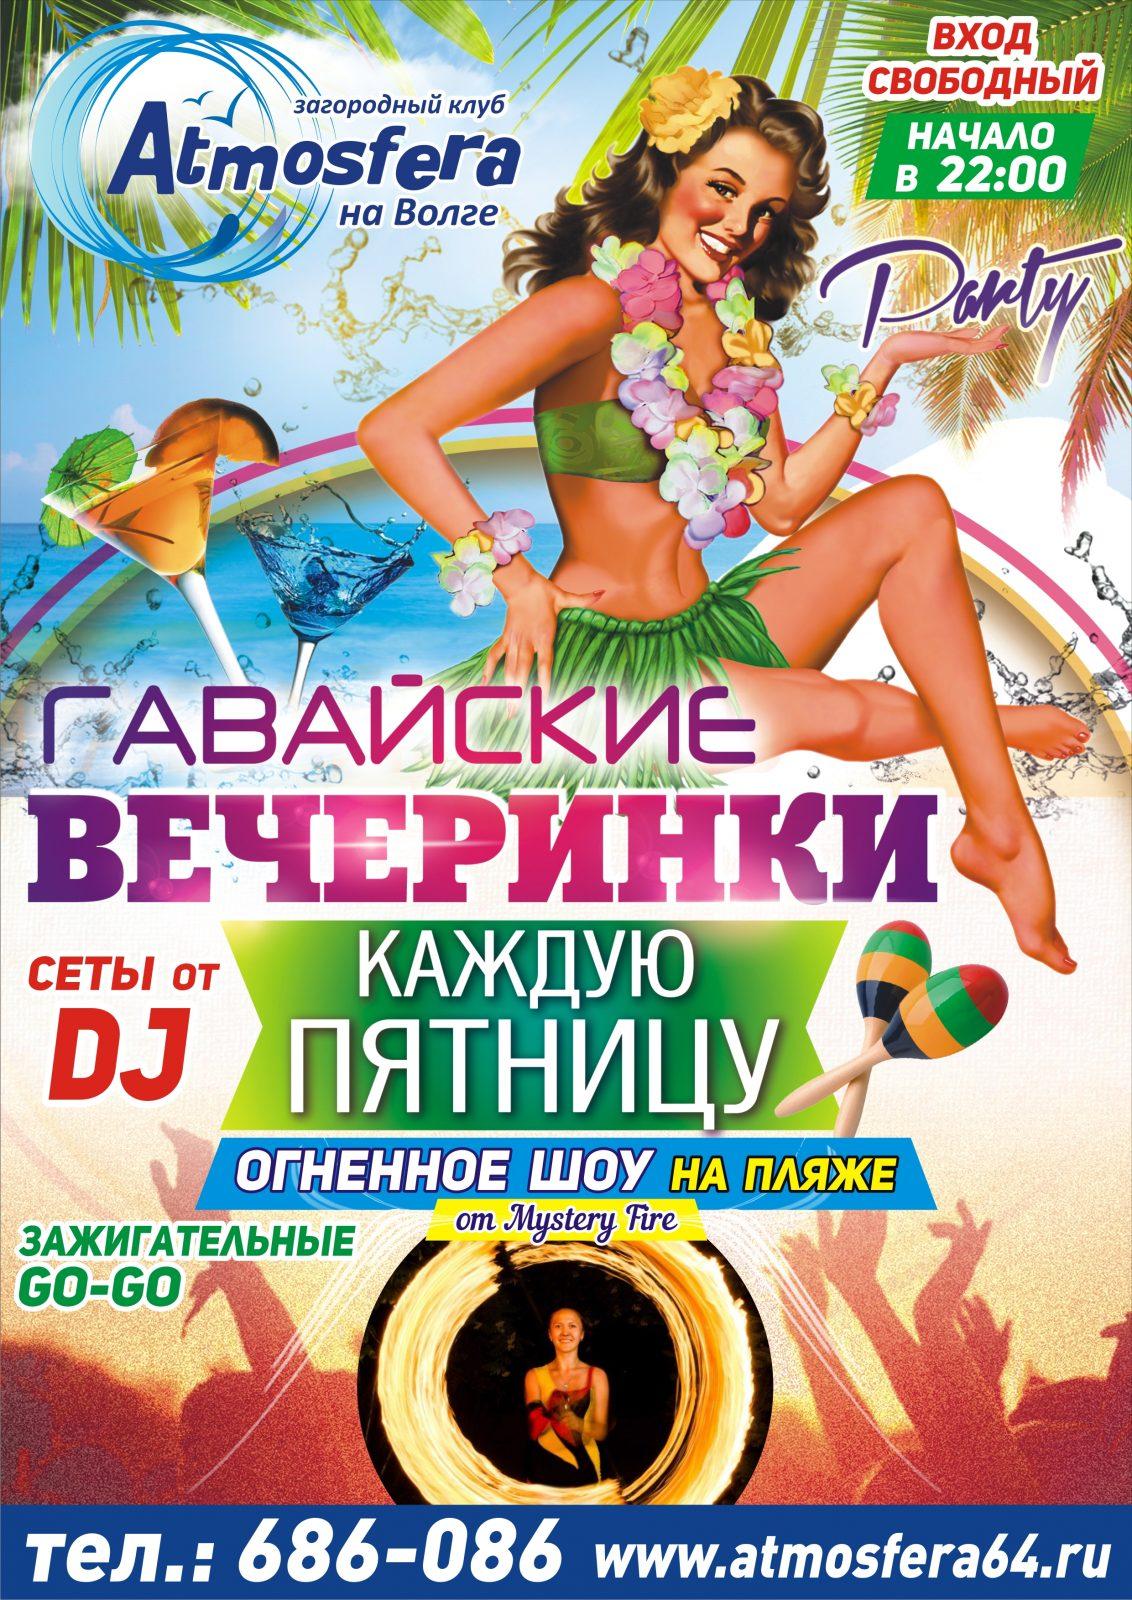 Meet Balakovo Women